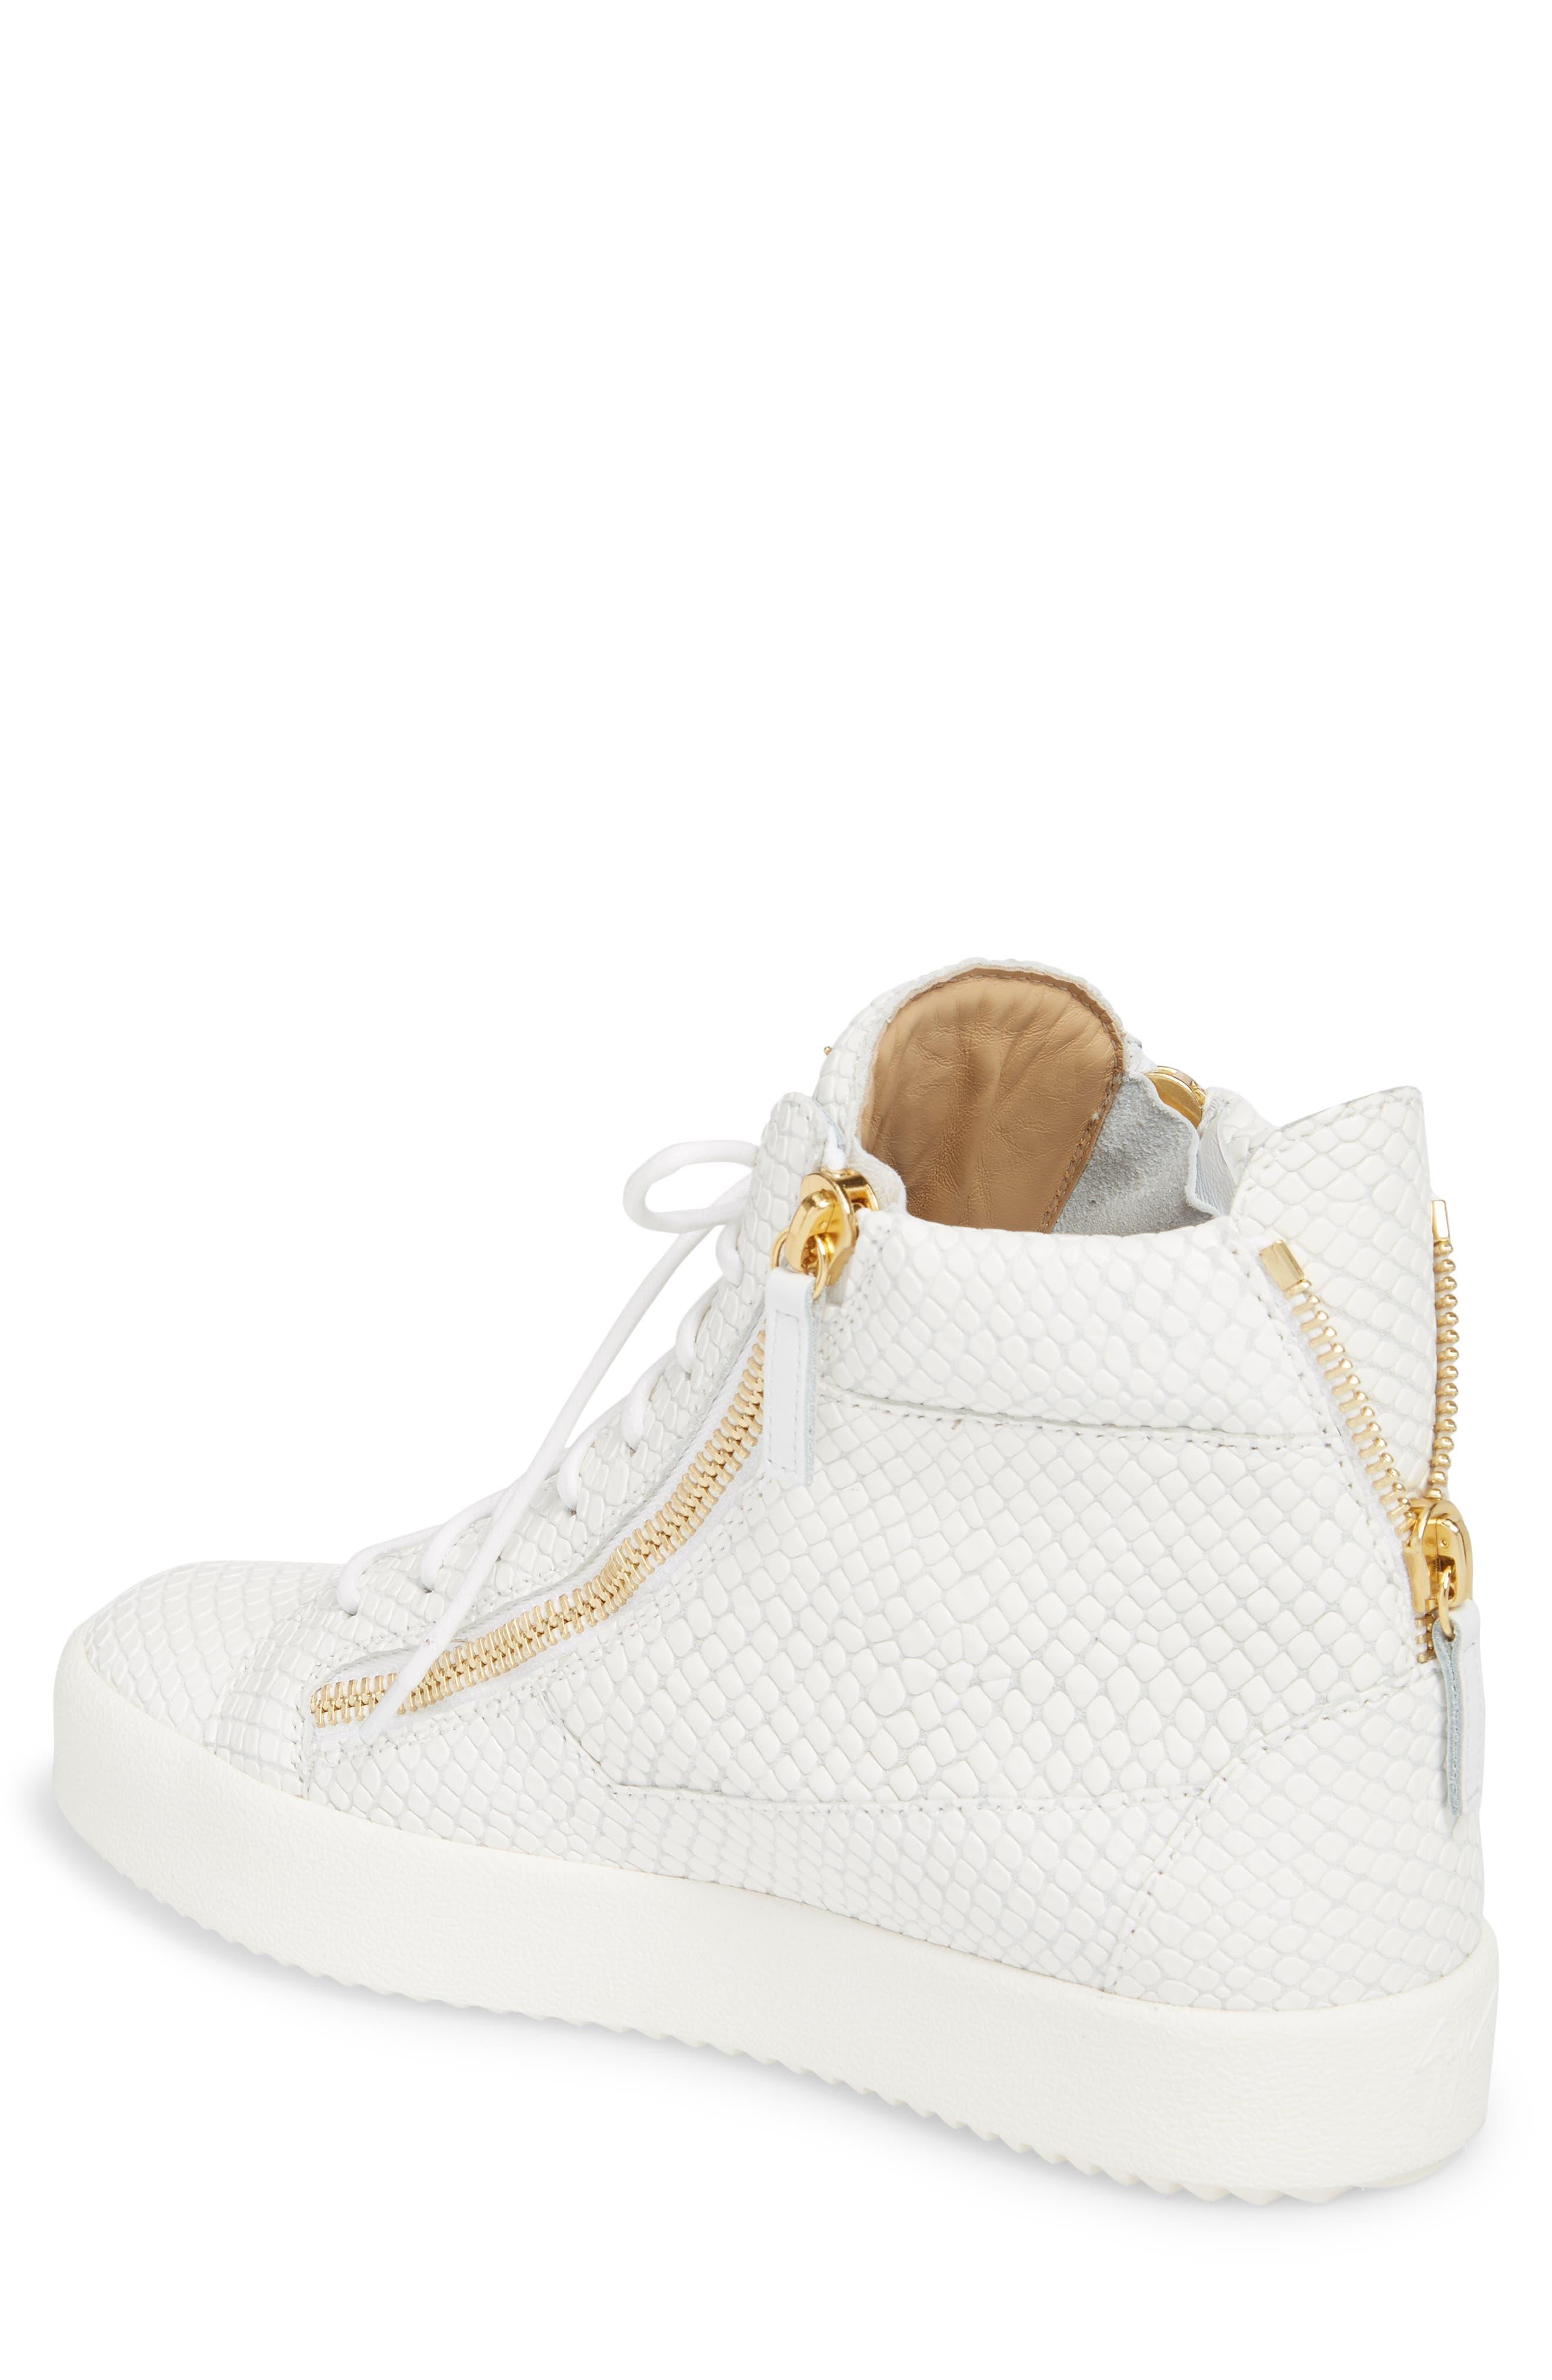 Snake Embossed High Top Sneaker,                             Alternate thumbnail 2, color,                             Bianco